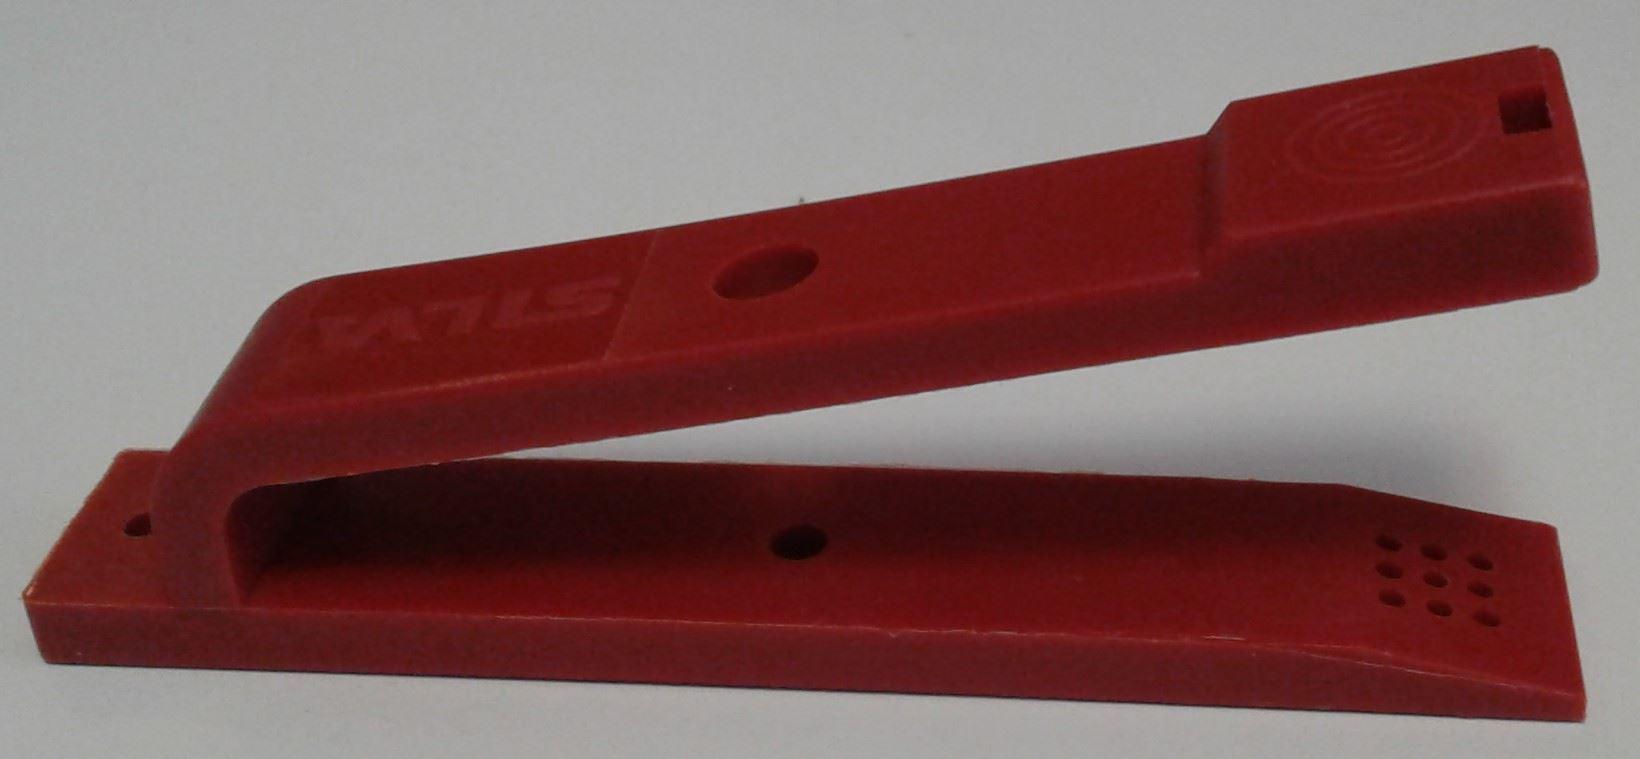 Image de Silva Orienteering Punches, set of 10